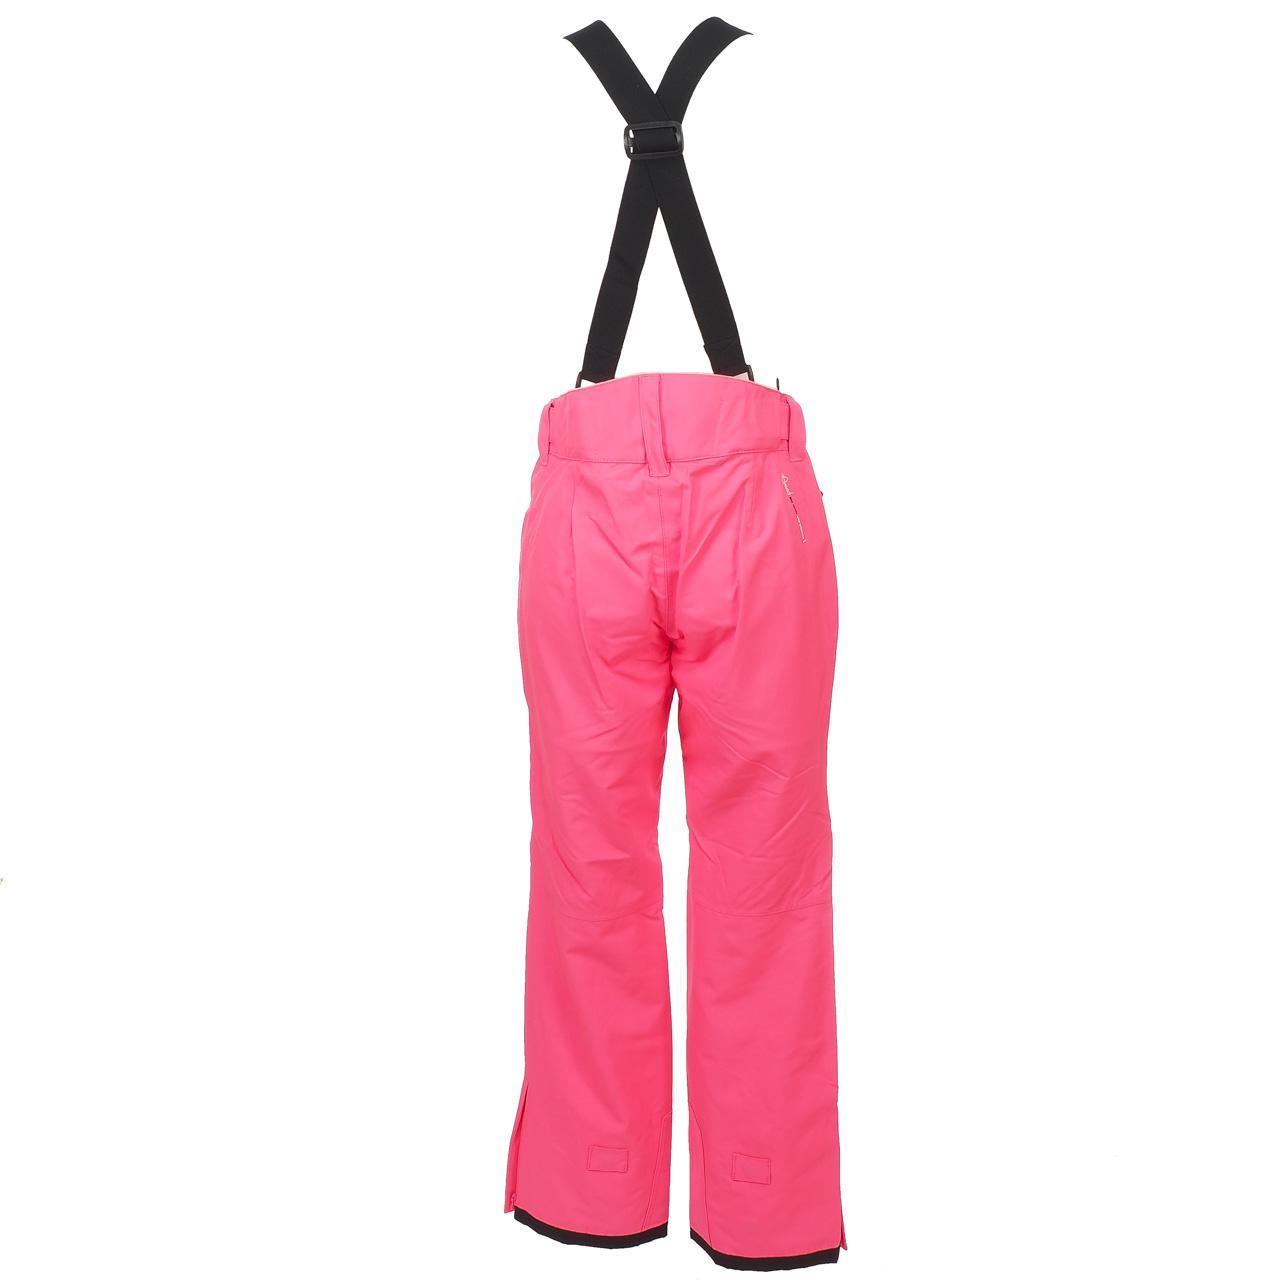 Ski-Pants-Surf-Dare-2b-Stand-for-II-Rsepantski-L-Pink-16116-New thumbnail 4